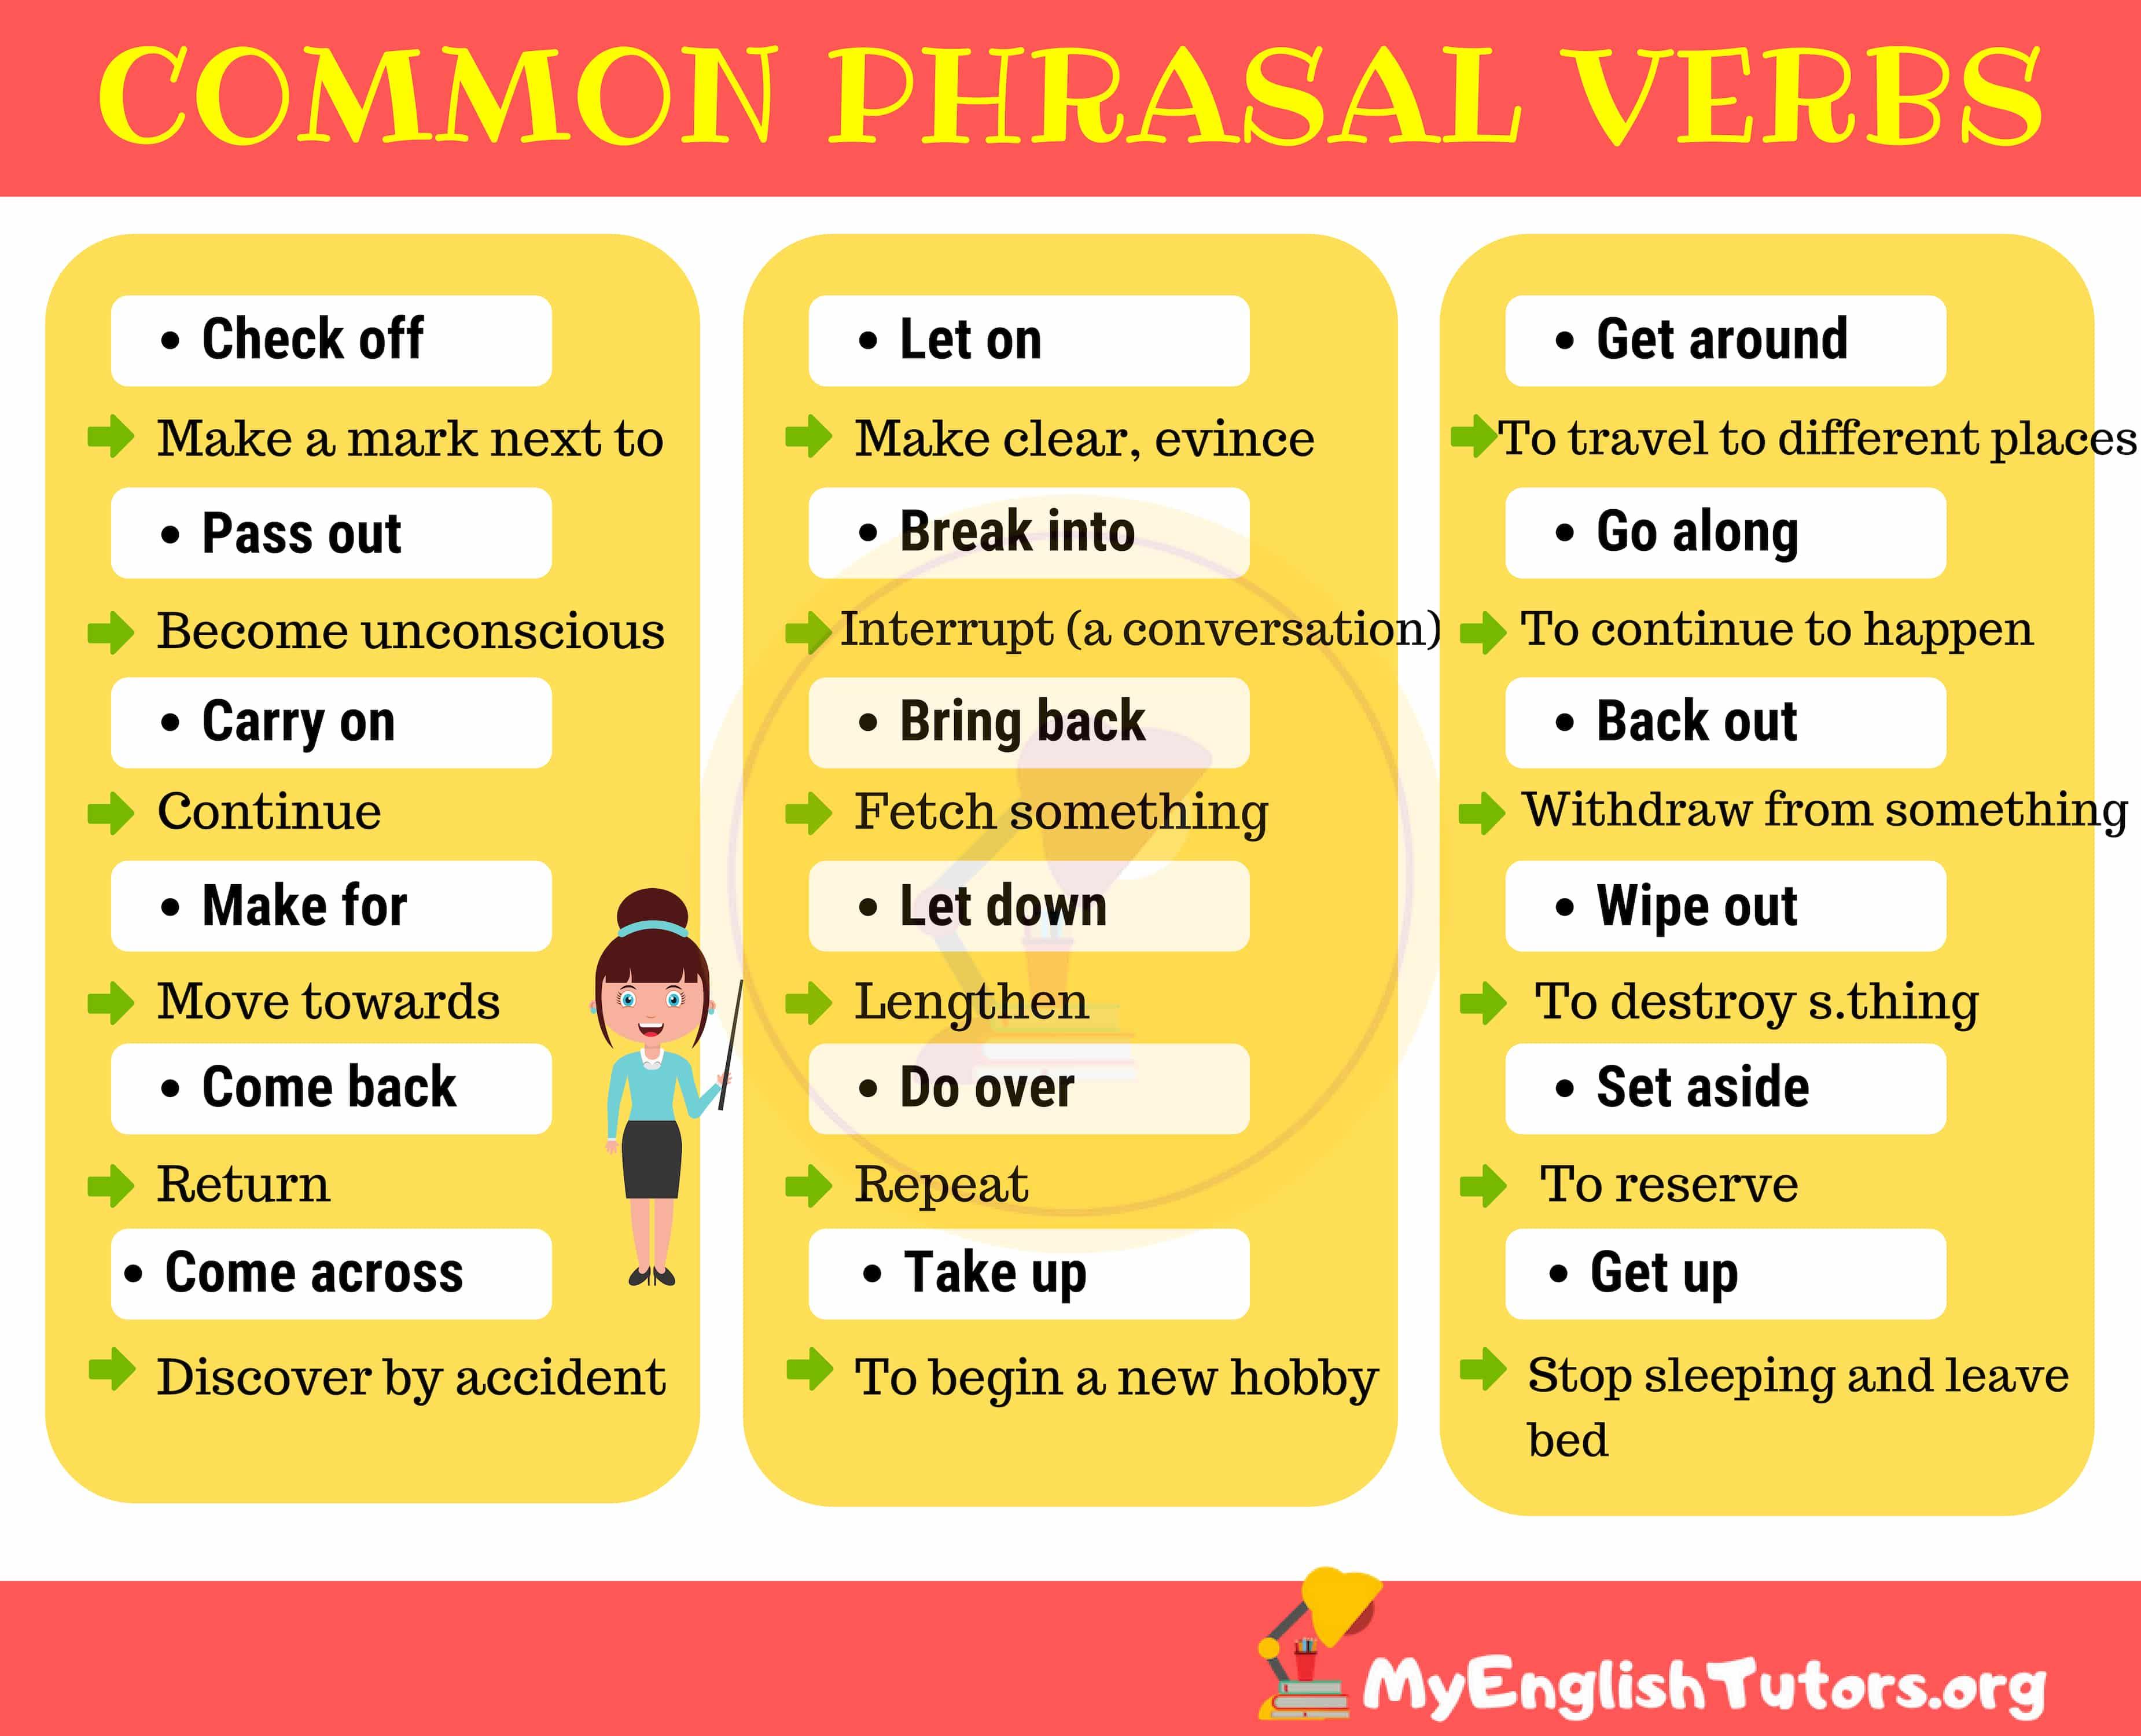 PhrasalVerbs List